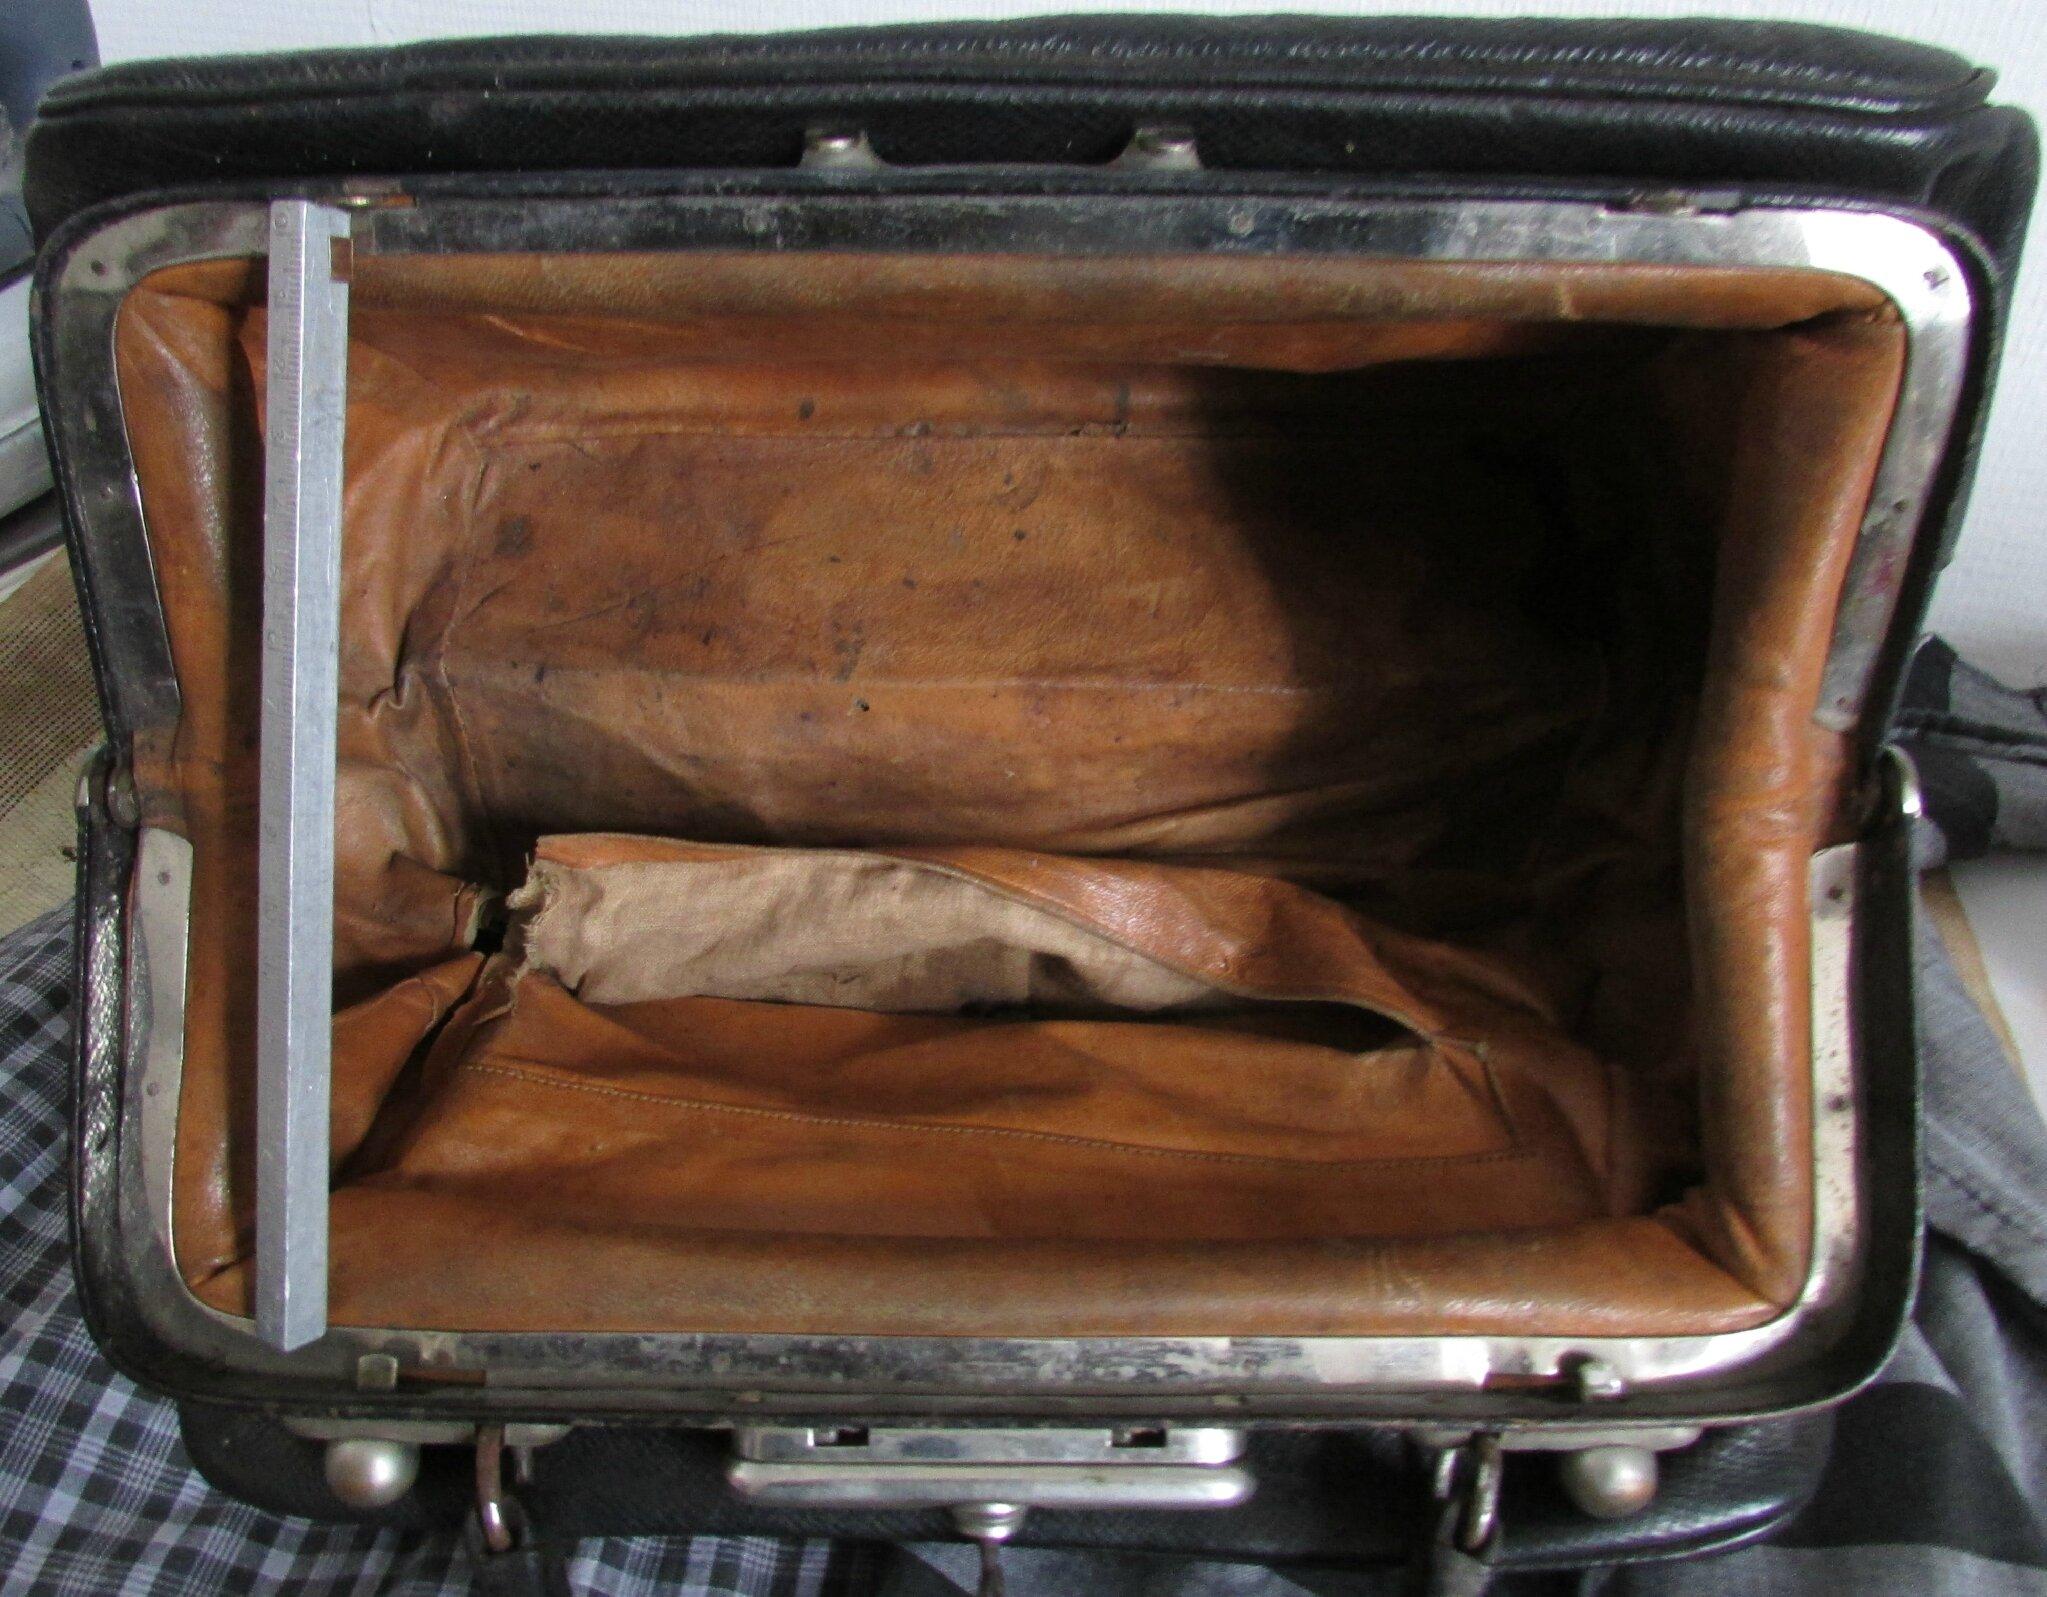 ancienn e sacoche de medecin sac ancien sacoche ancienne en cuir noir chantale poucel a. Black Bedroom Furniture Sets. Home Design Ideas